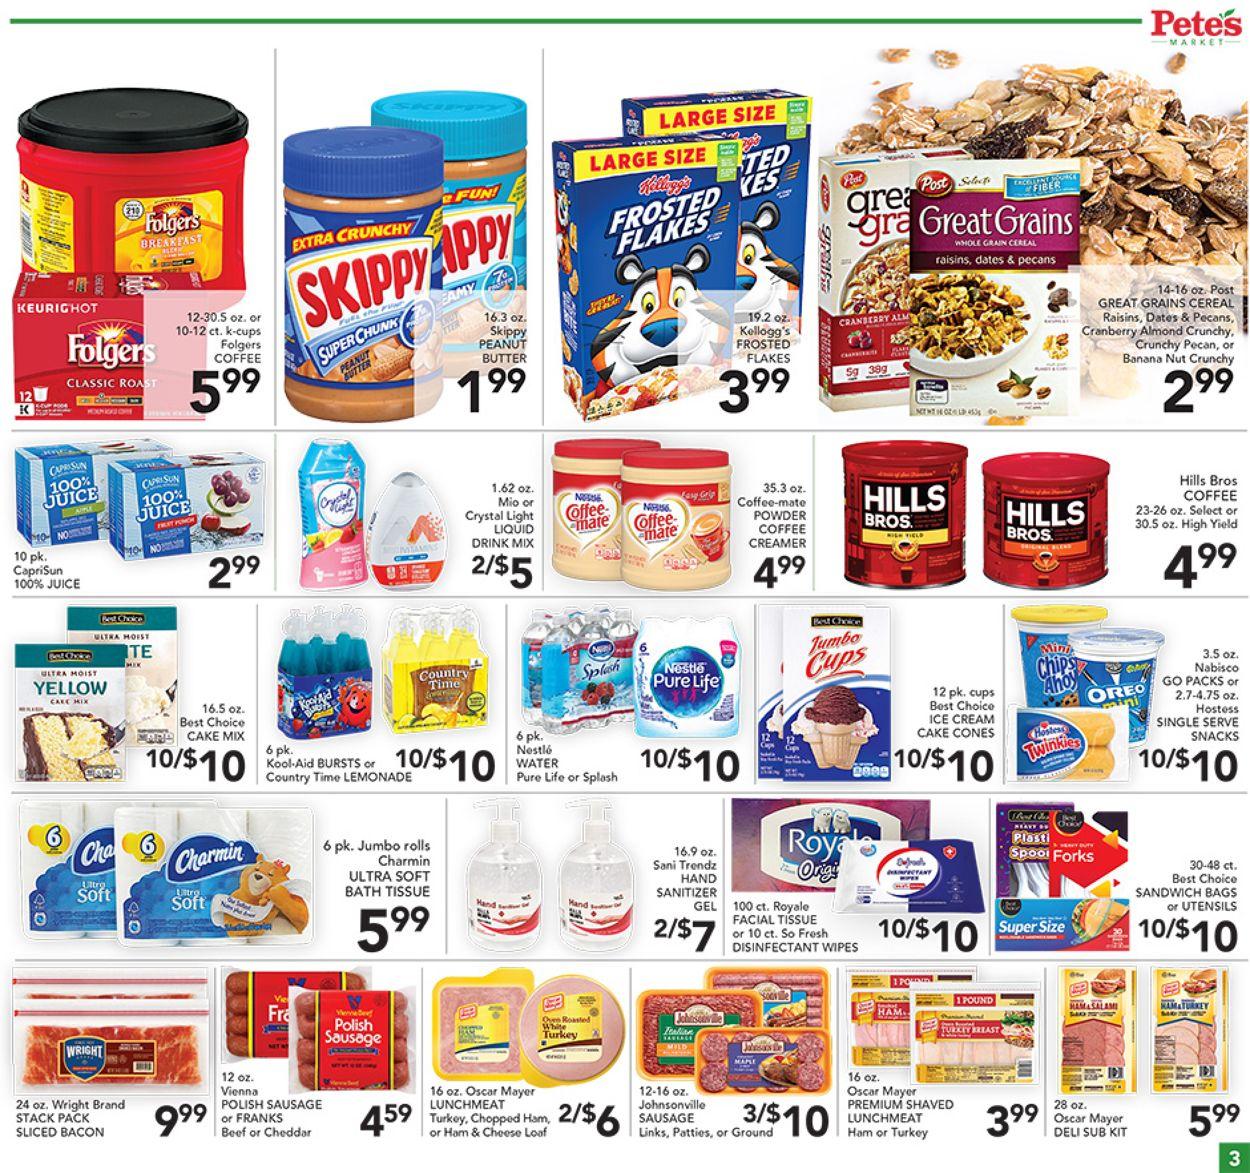 Pete's Fresh Market Weekly Ad Circular - valid 07/21-07/27/2021 (Page 3)